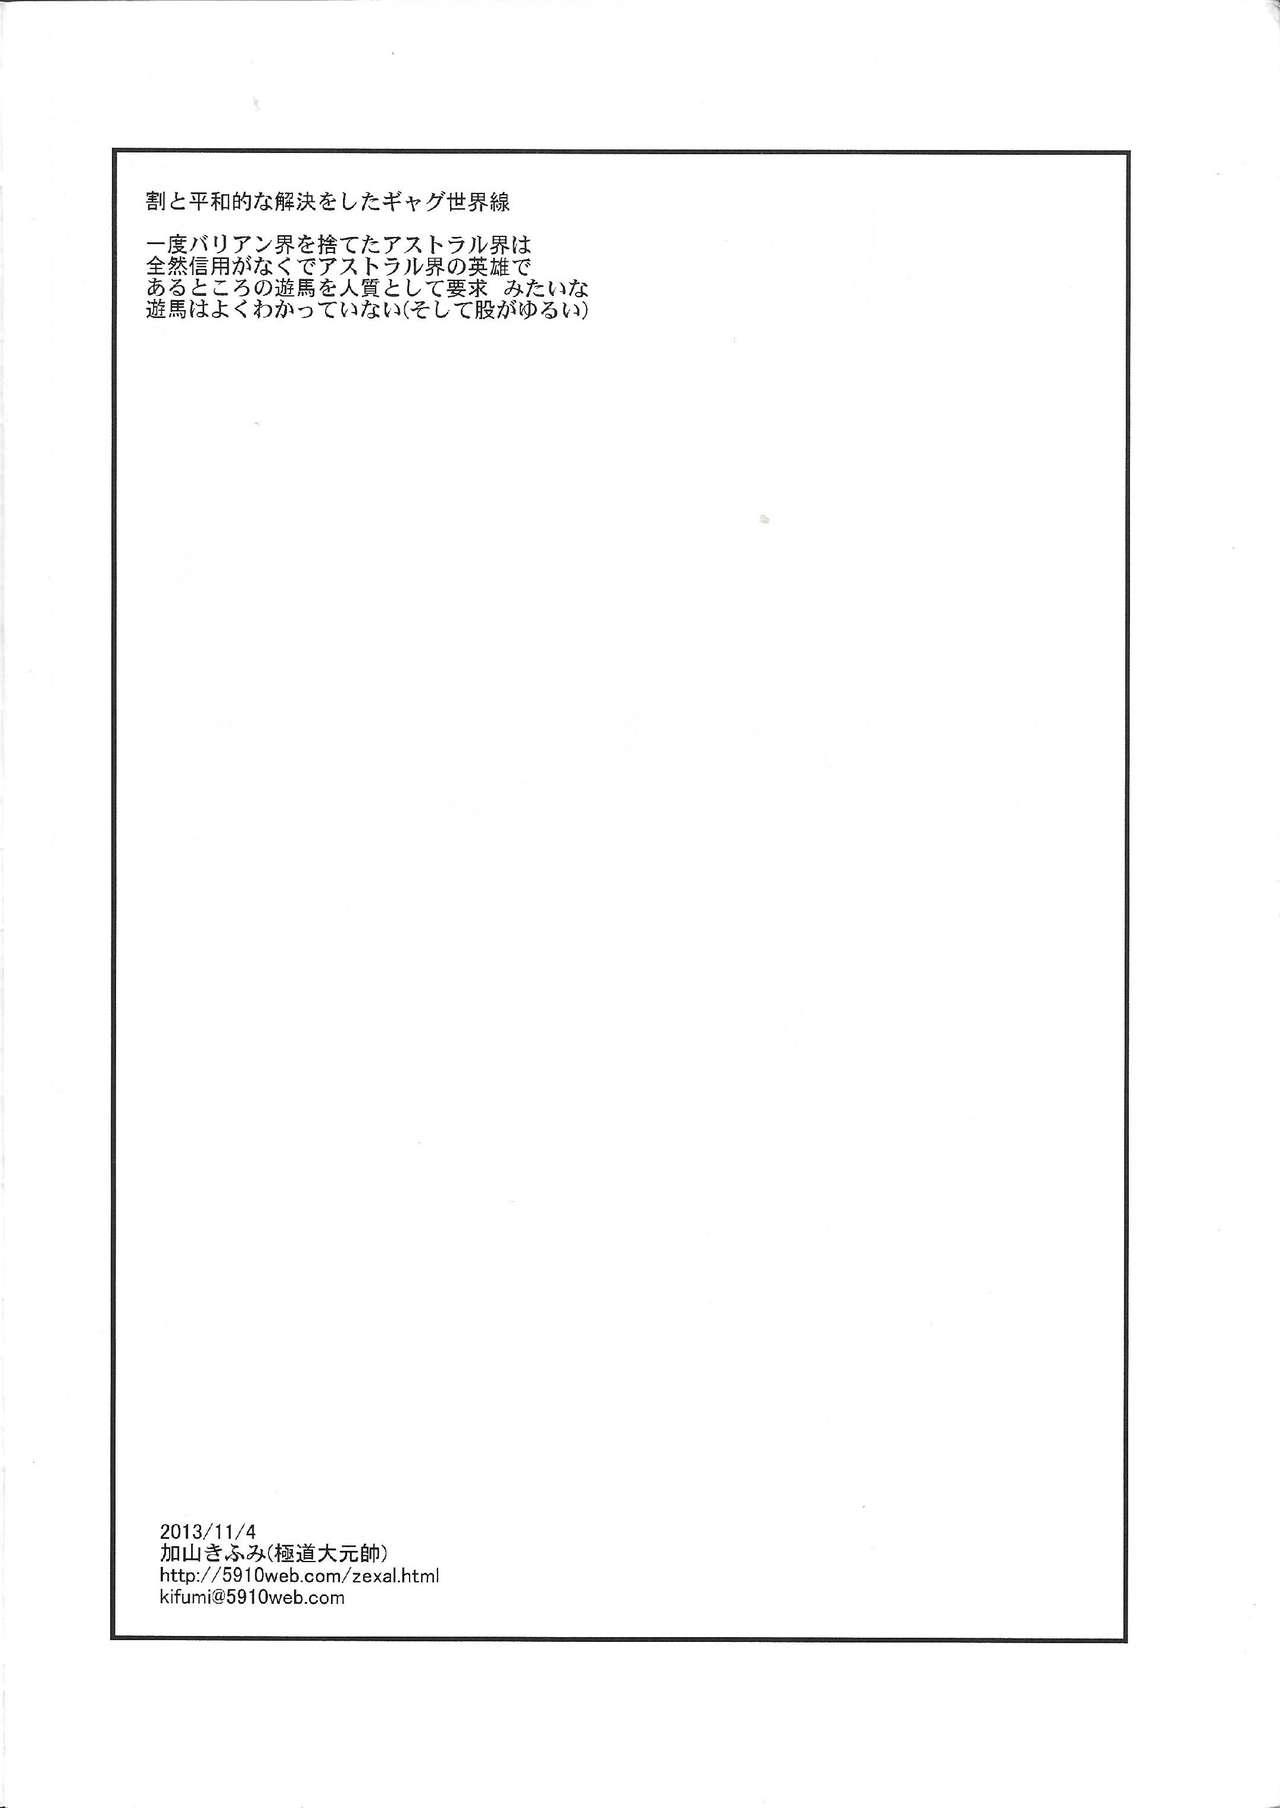 Zexal Copybook 10